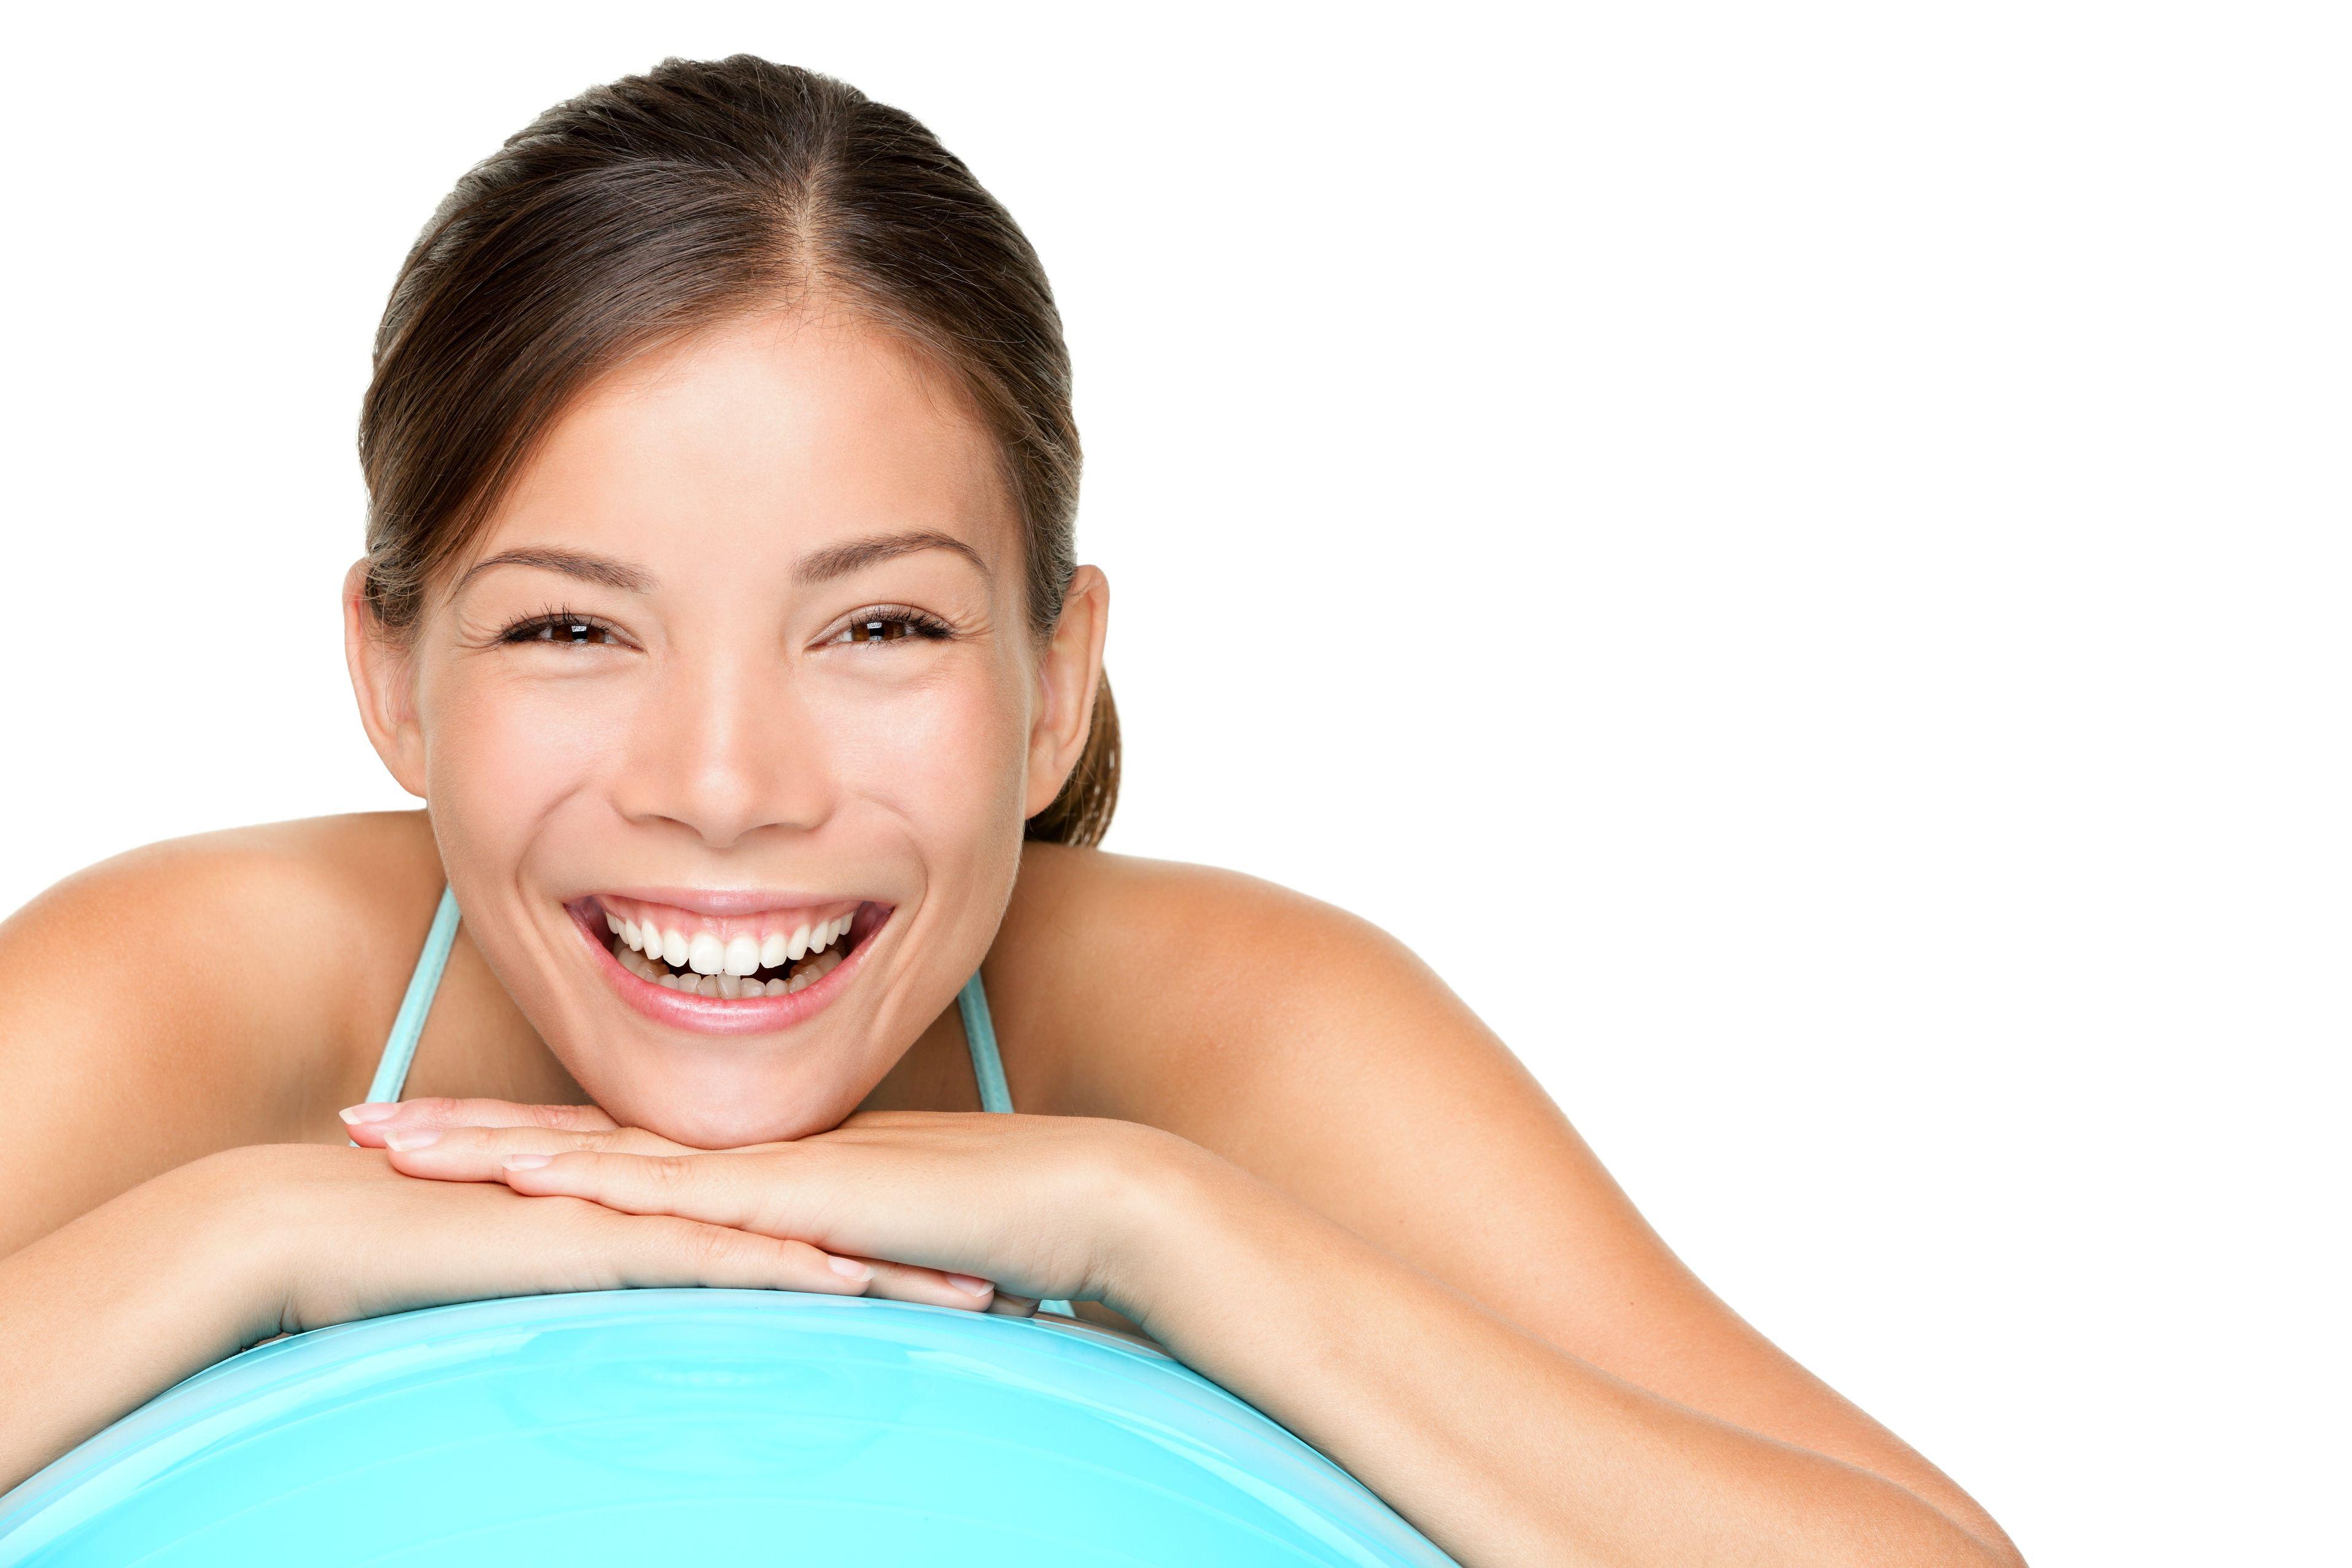 Teeth Whitening in Leonia